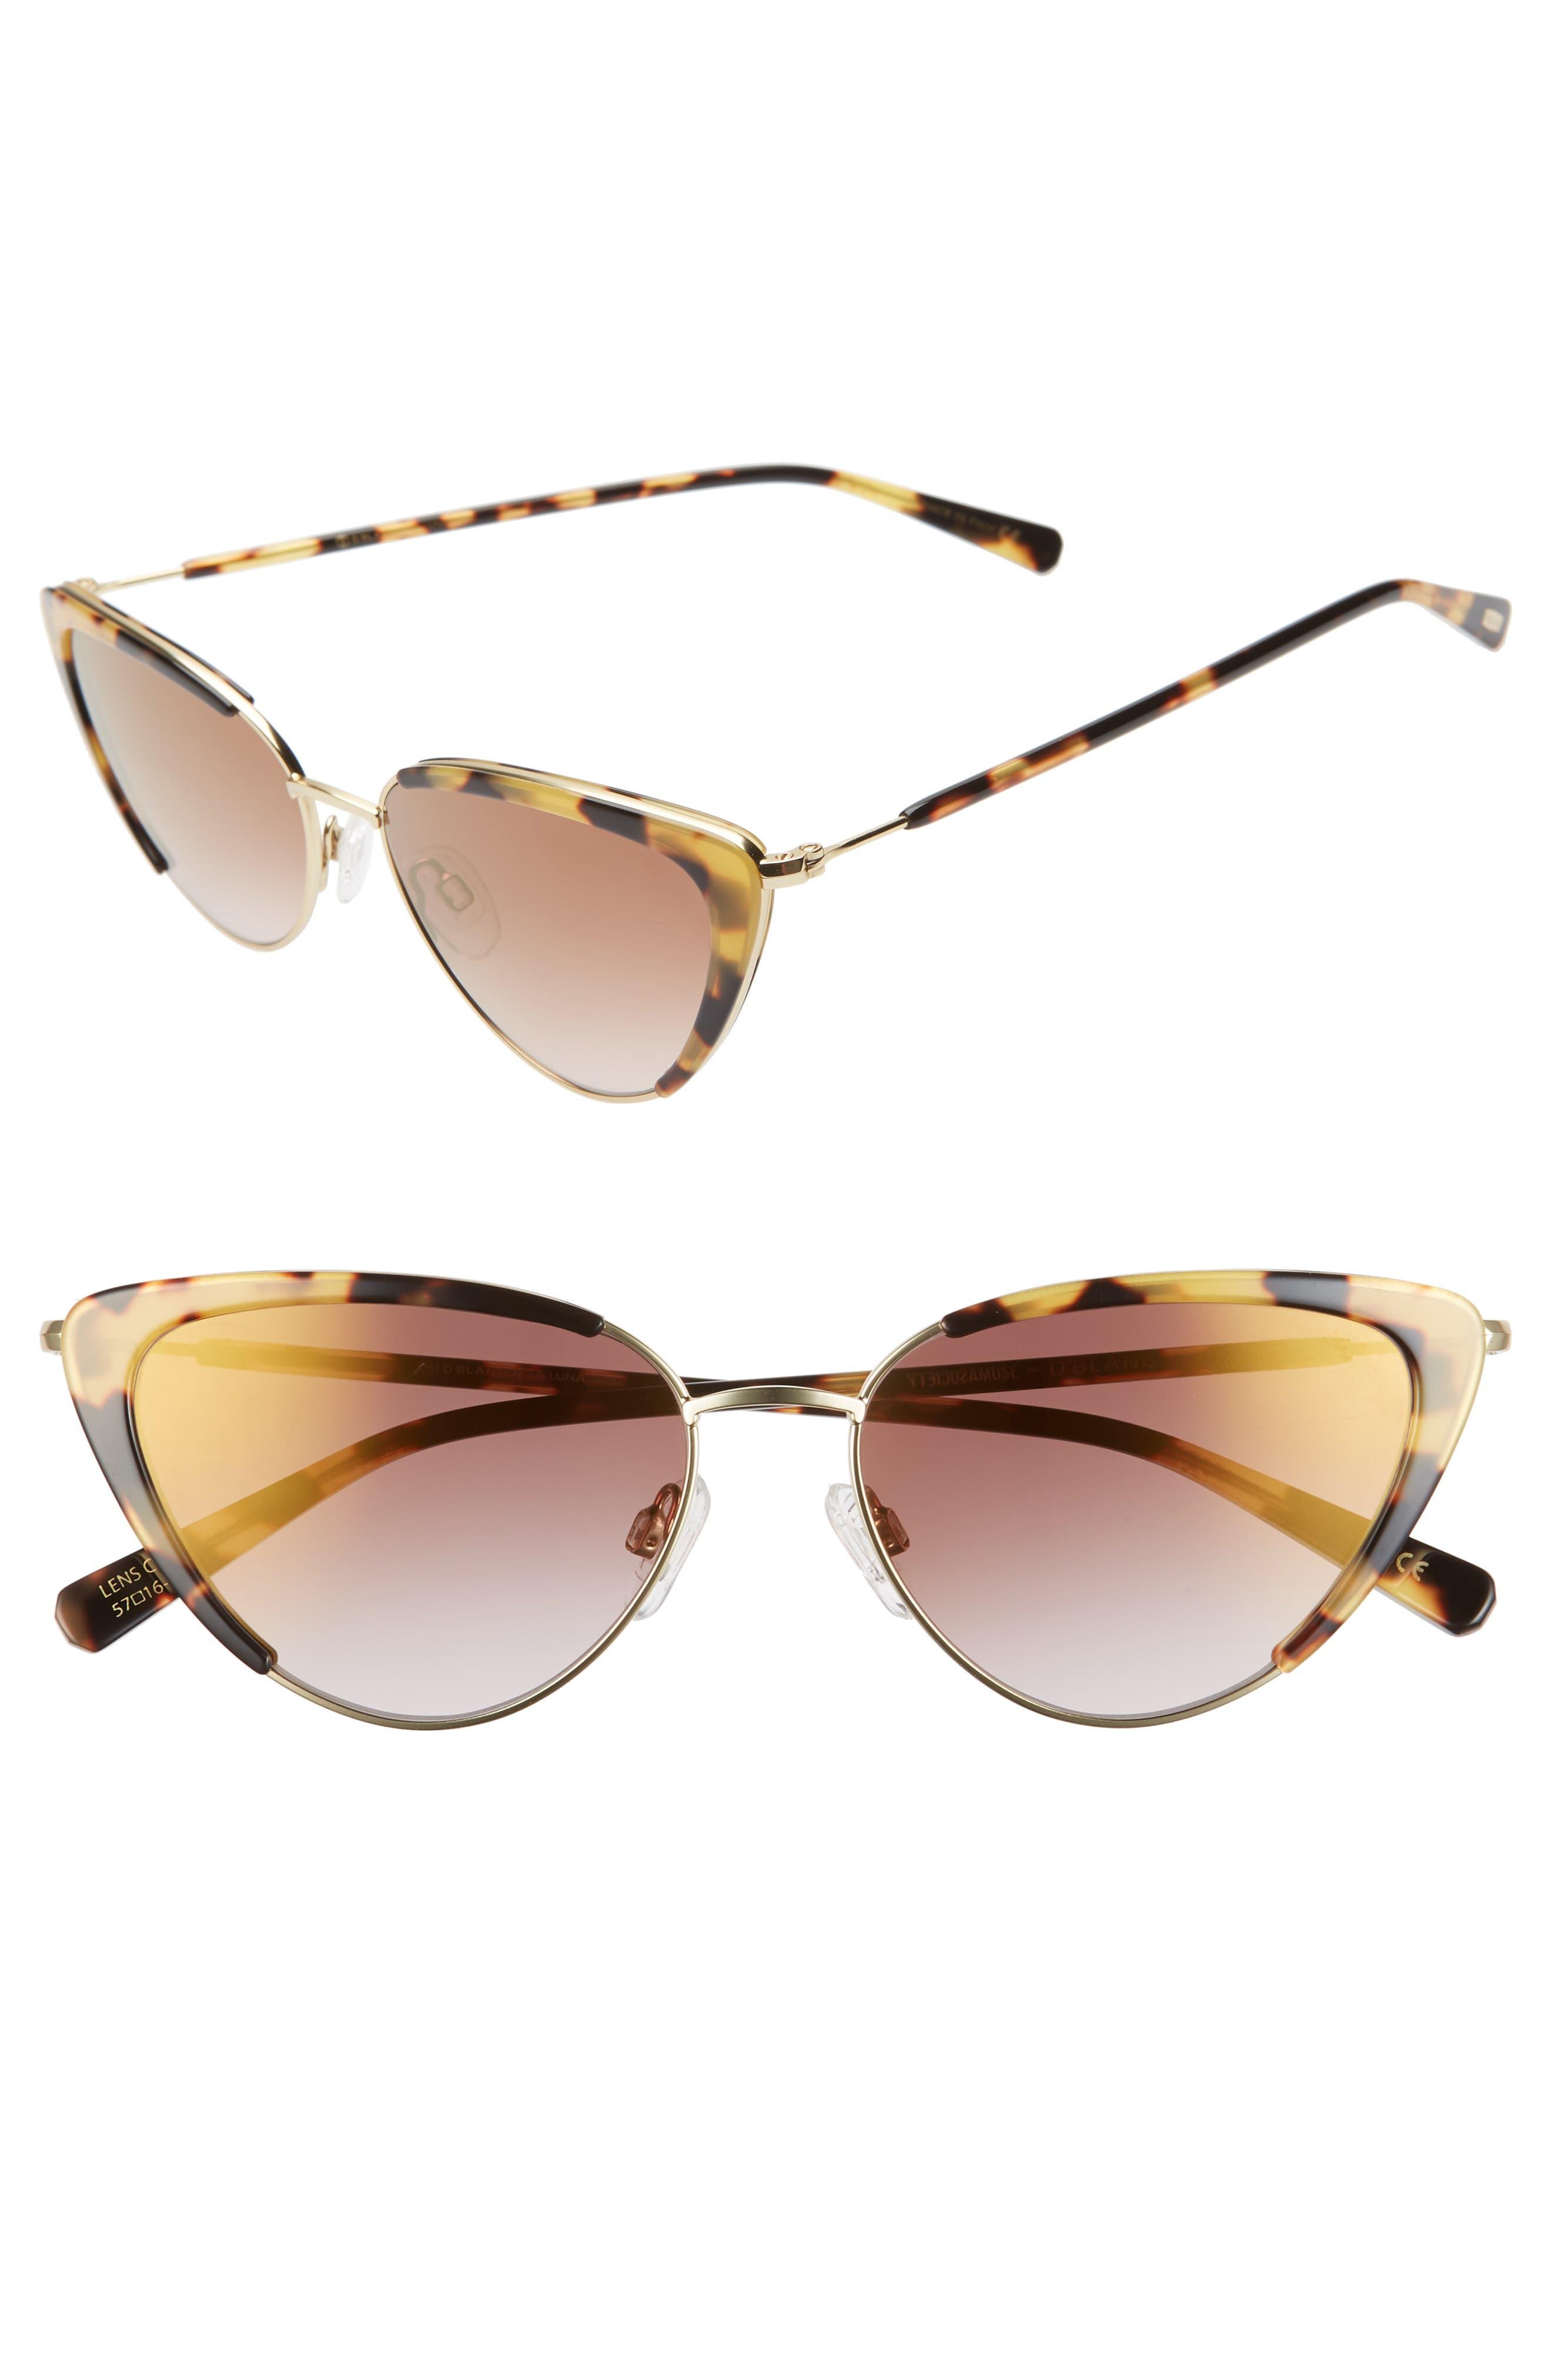 1950s Sunglasses & 50s Glasses   Retro Cat Eye Sunglasses Womens DBlanc X Amuse Society La Luna 57Mm Cat Eye Sunglasses - $180.00 AT vintagedancer.com